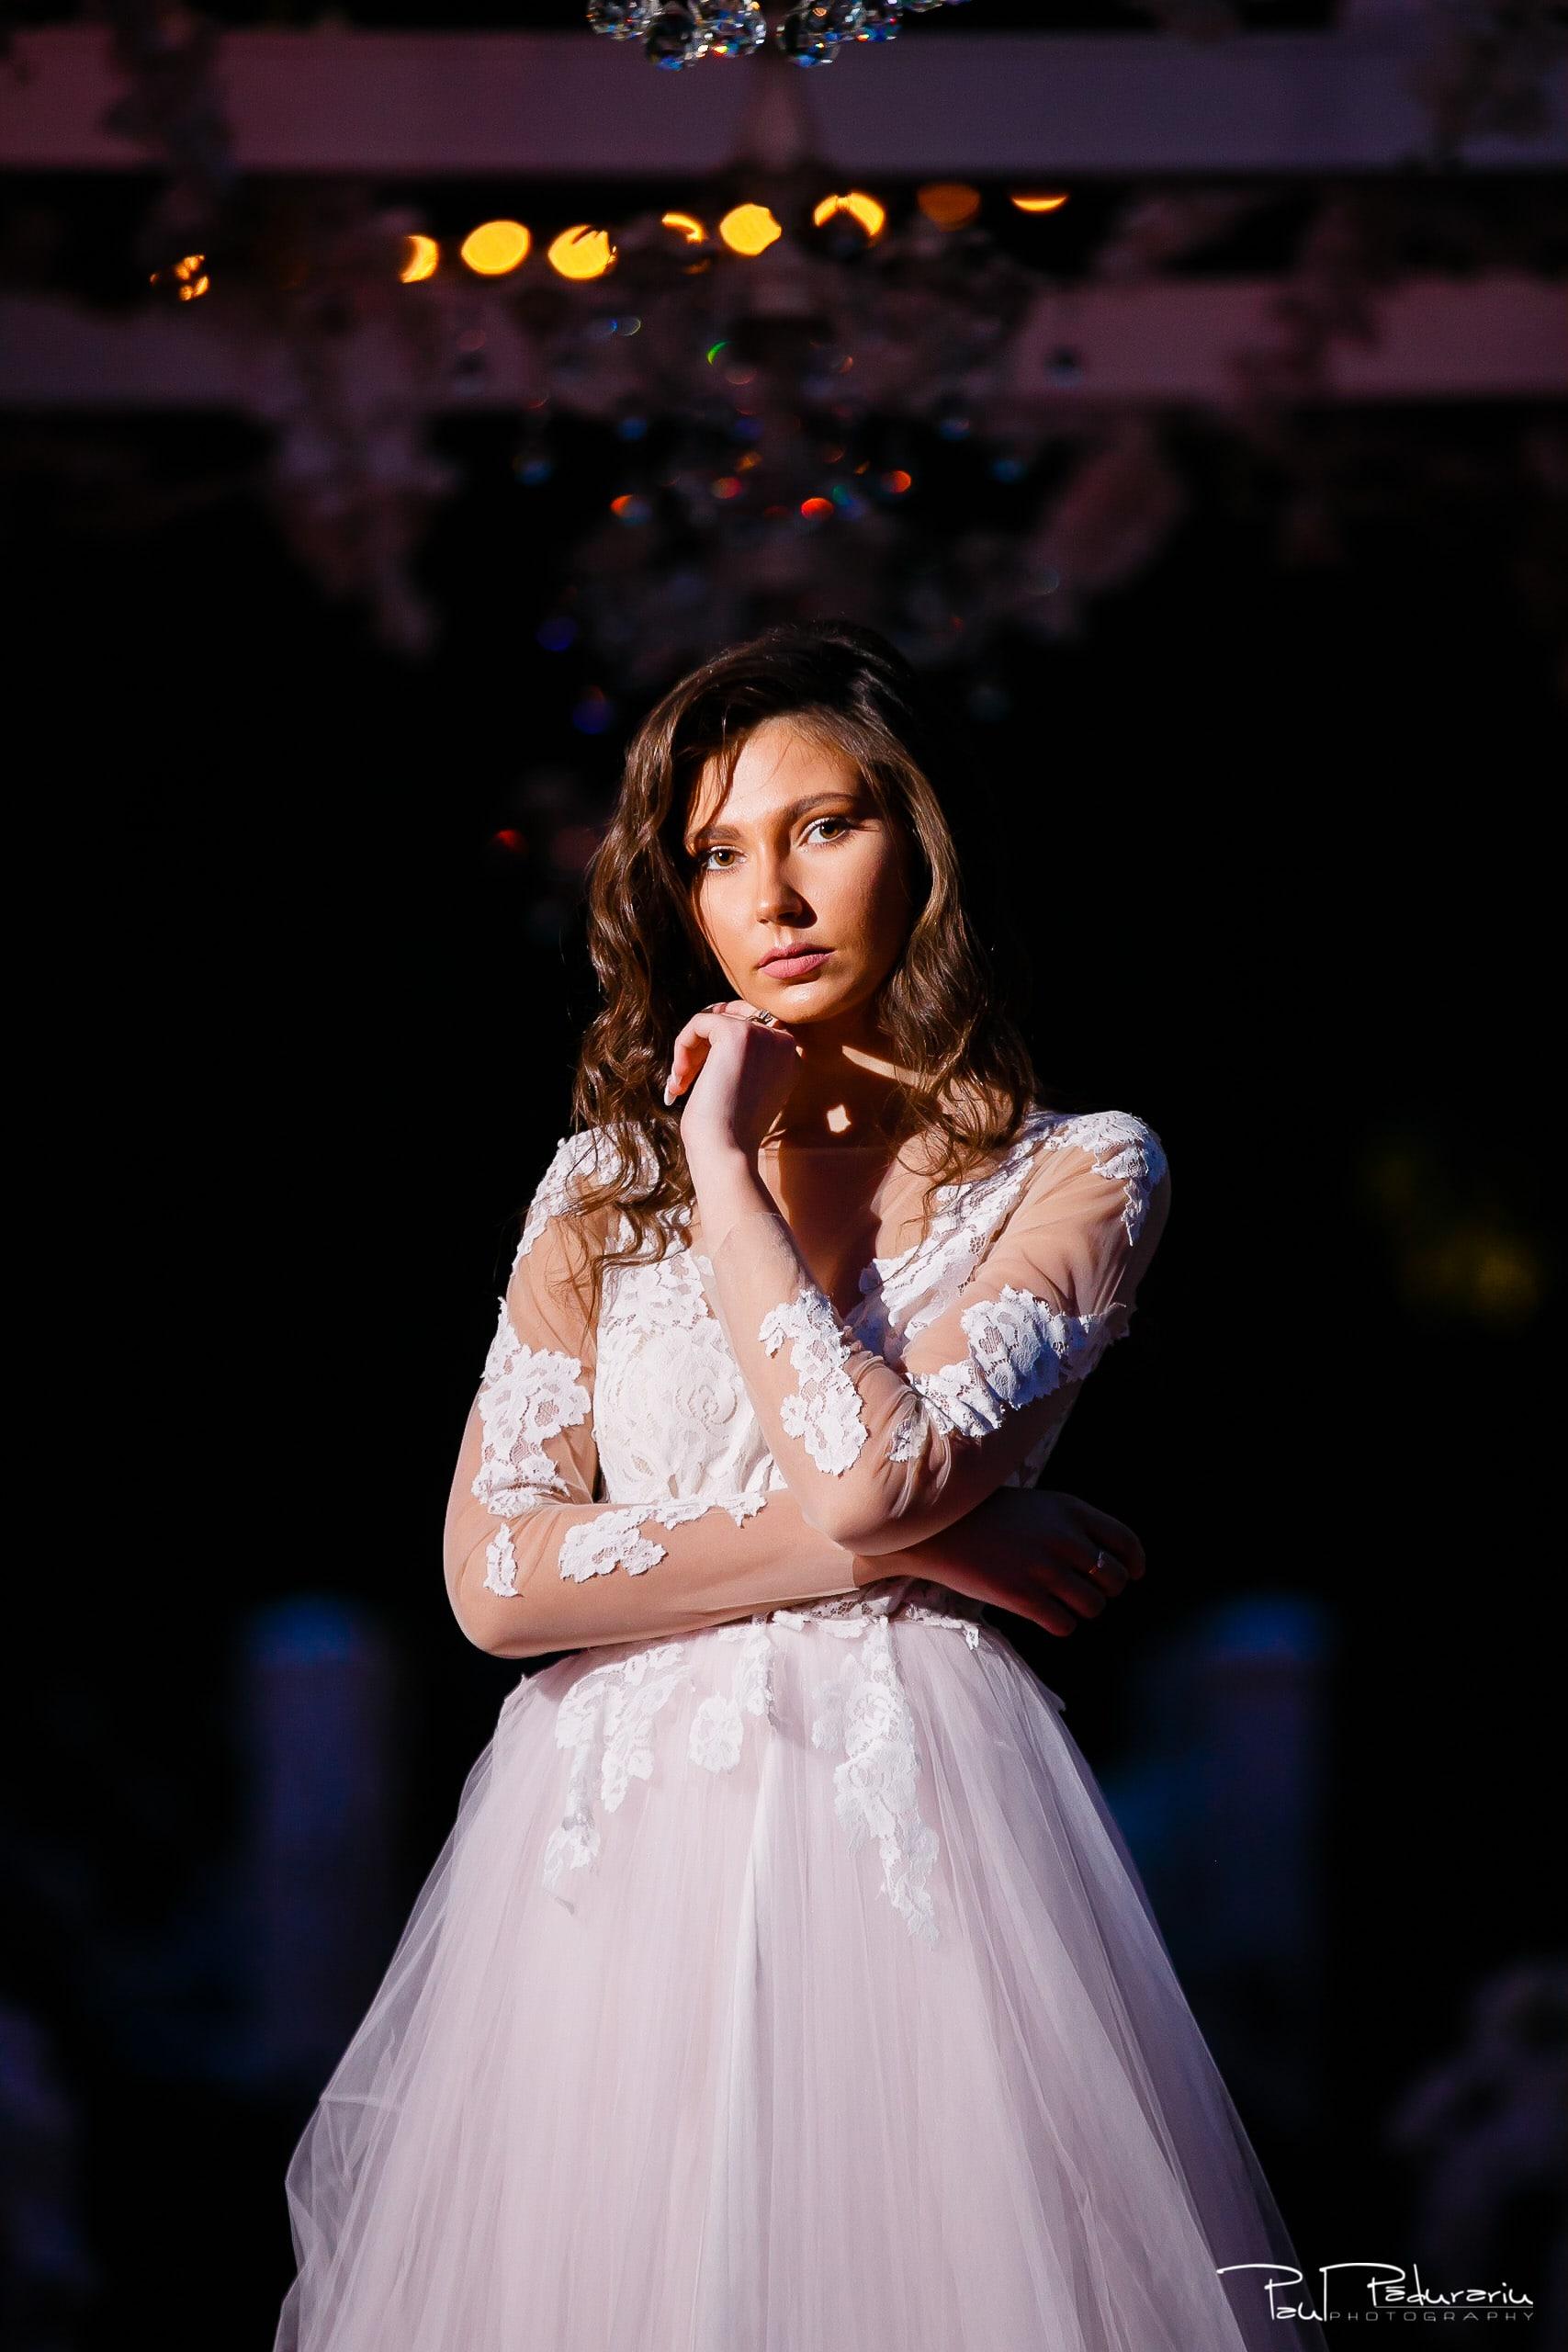 Modern Bride Edith Val colectie rochie mireasa 2019 - fotograf profesionist iasi paul padurariu | nunta iasi 19